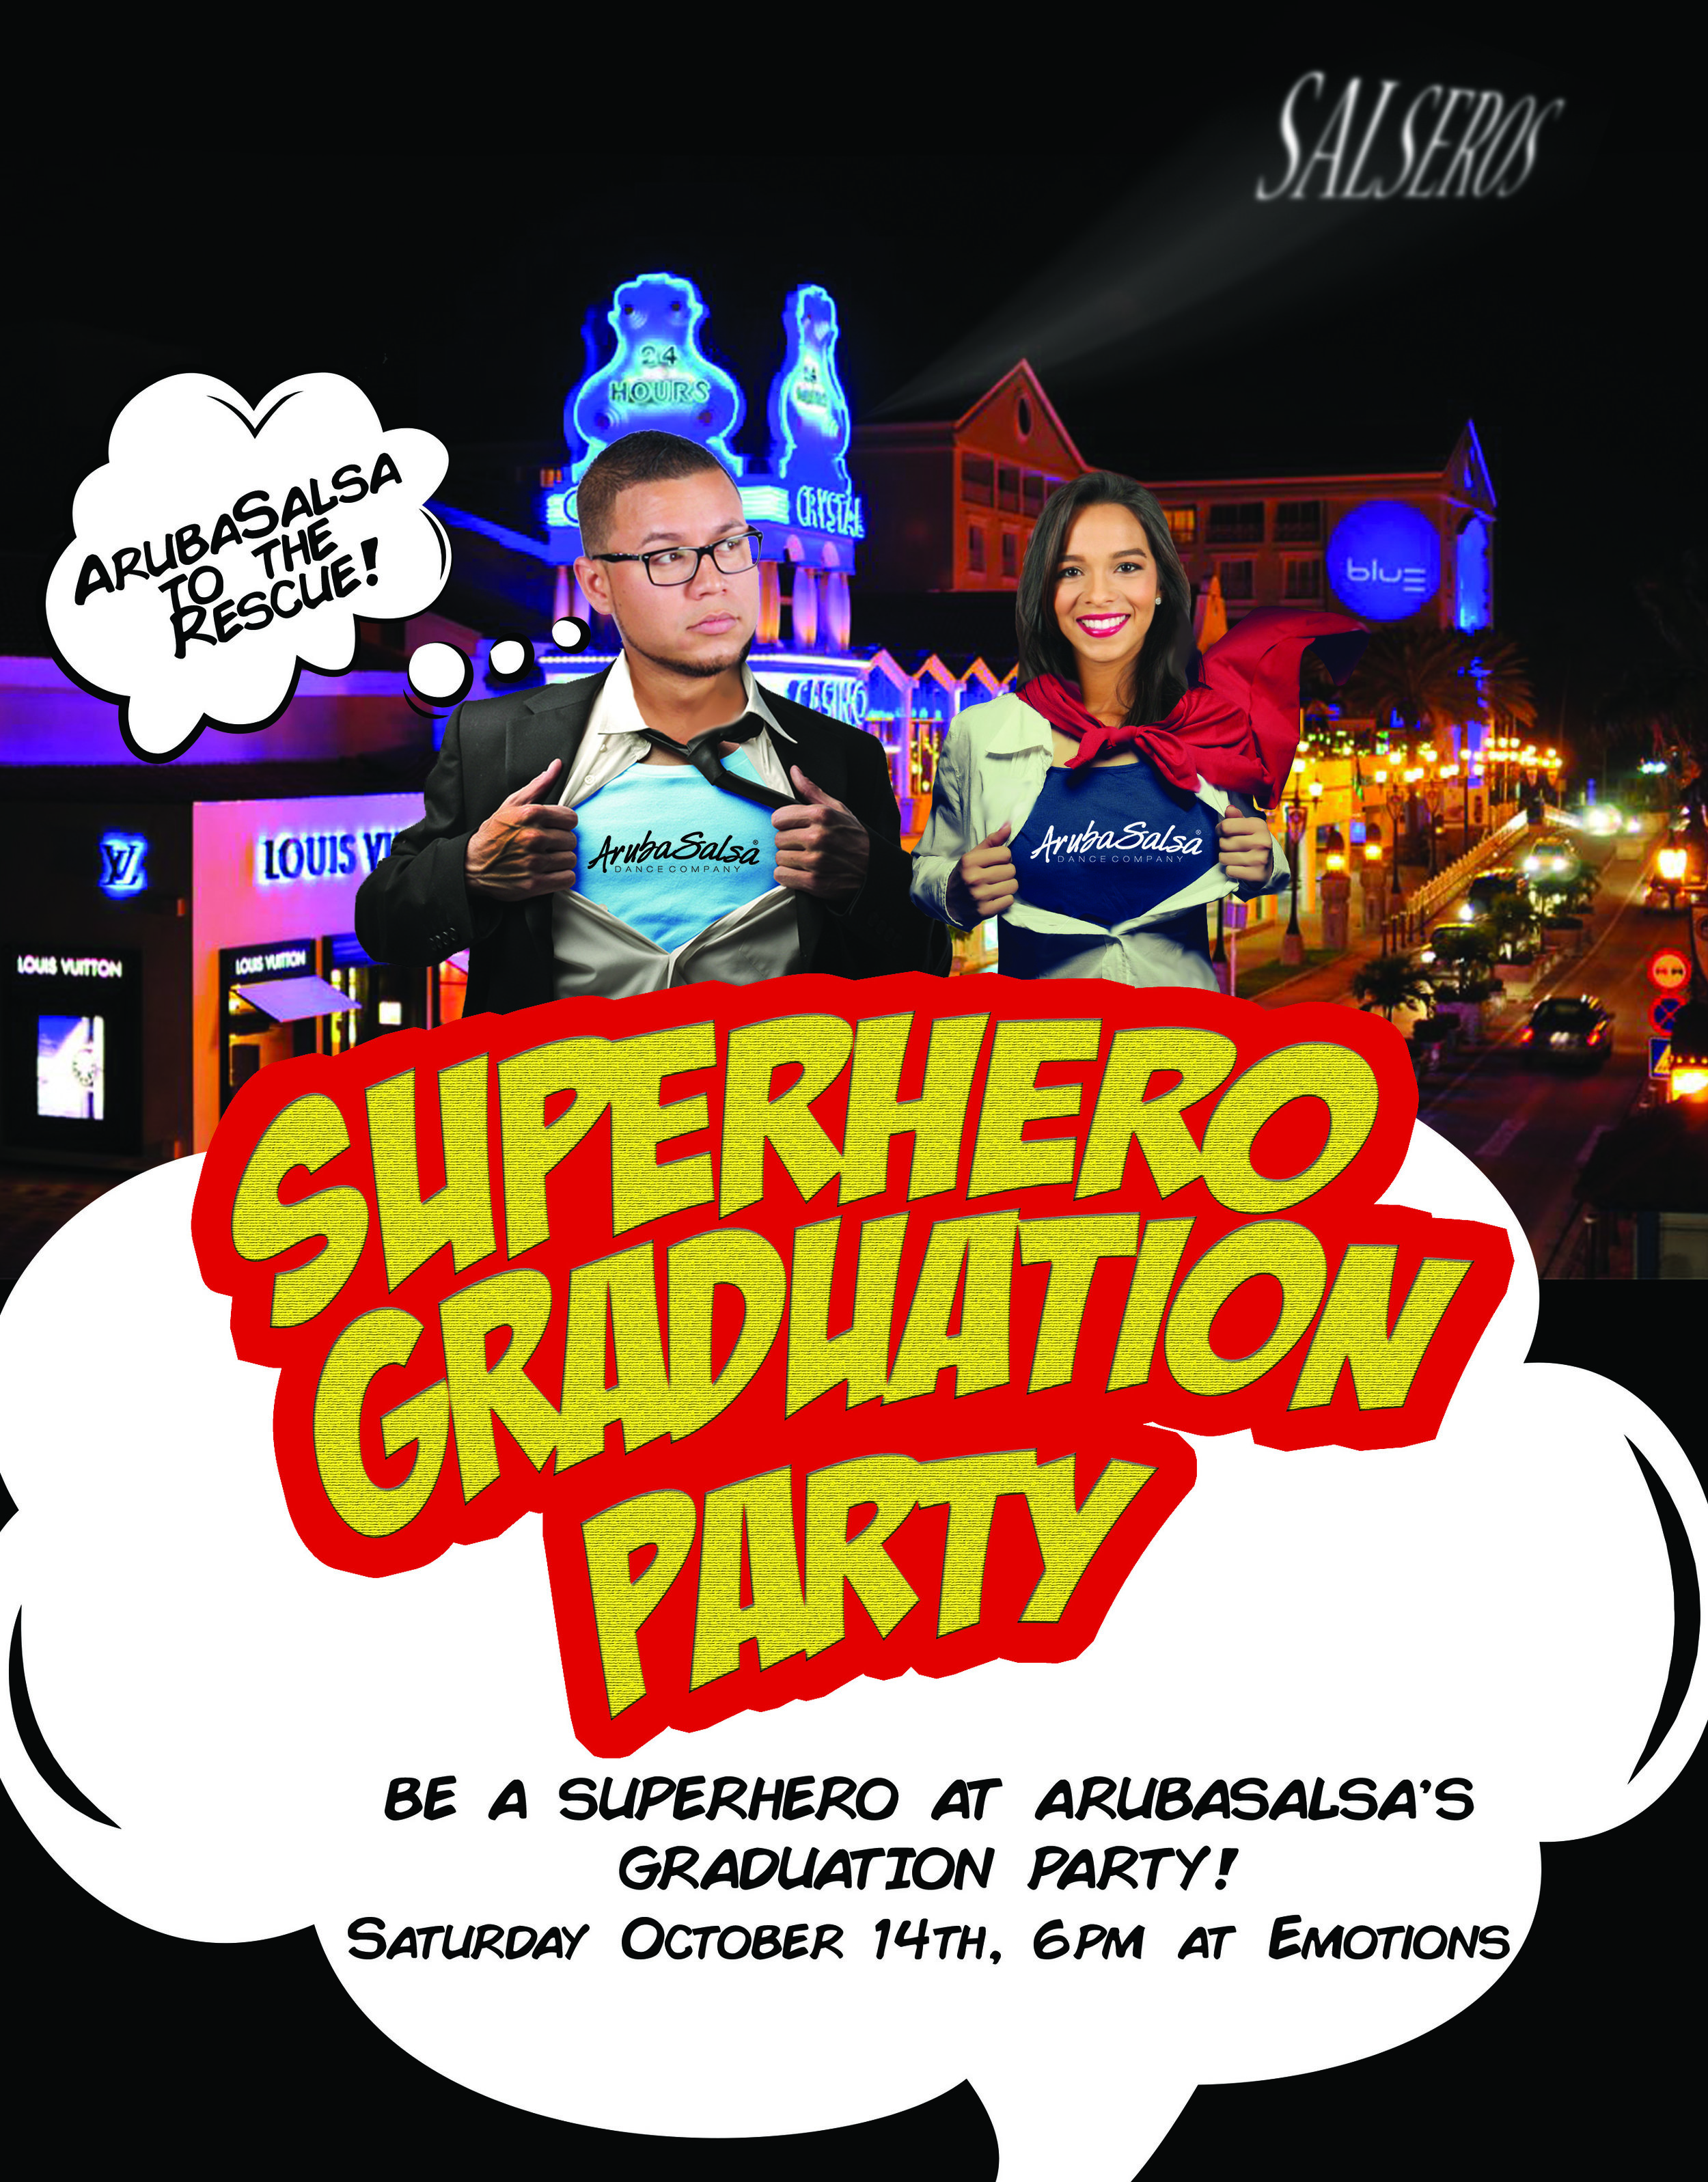 Superhero graduation party.jpg